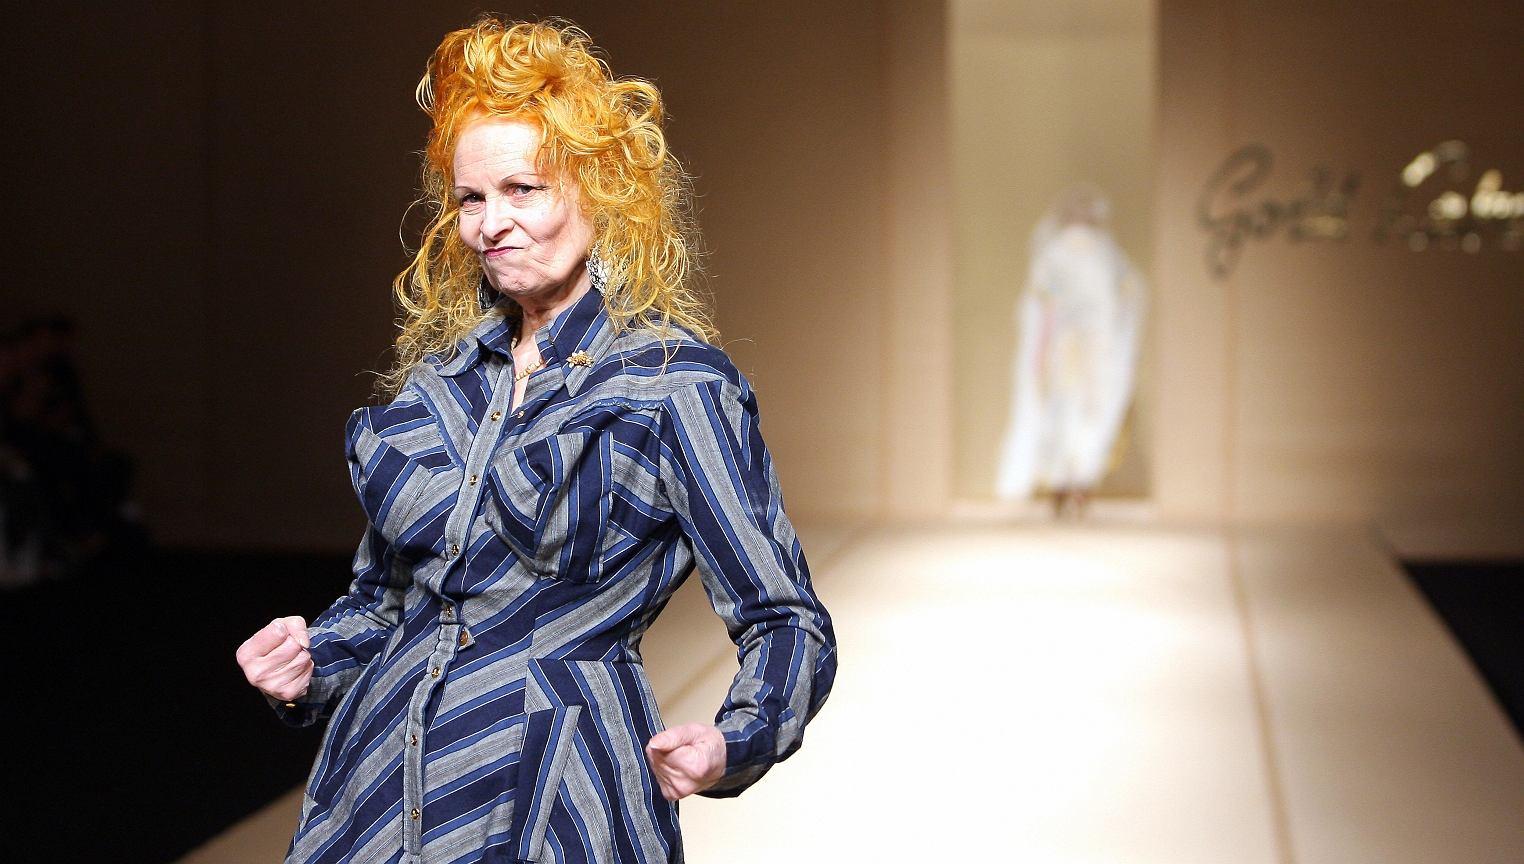 Vivienne Westwood to brytyjska legenda mody i punk rocka